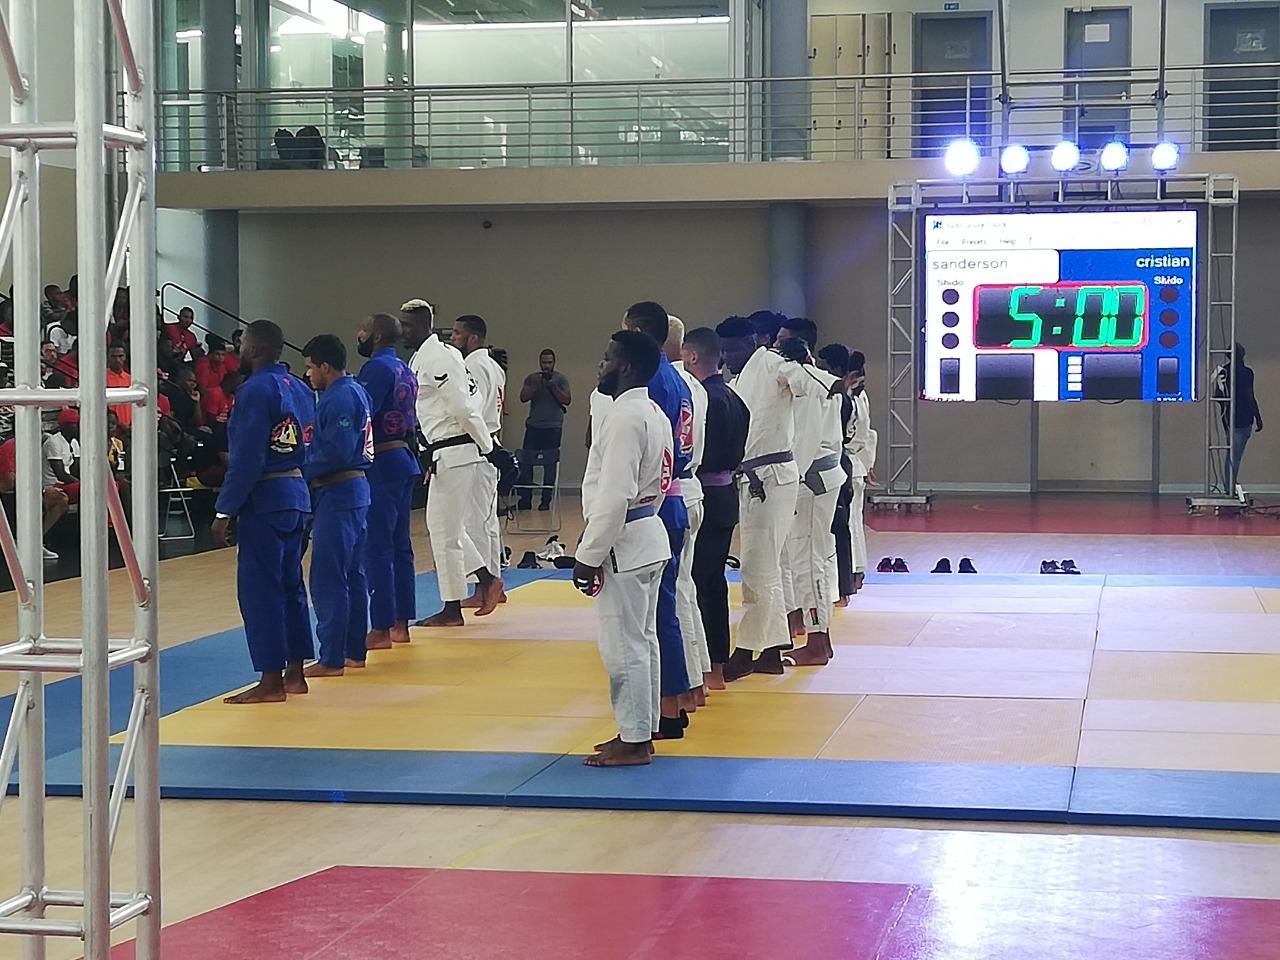 Duelo de Titãs junta atletas de artes marciais